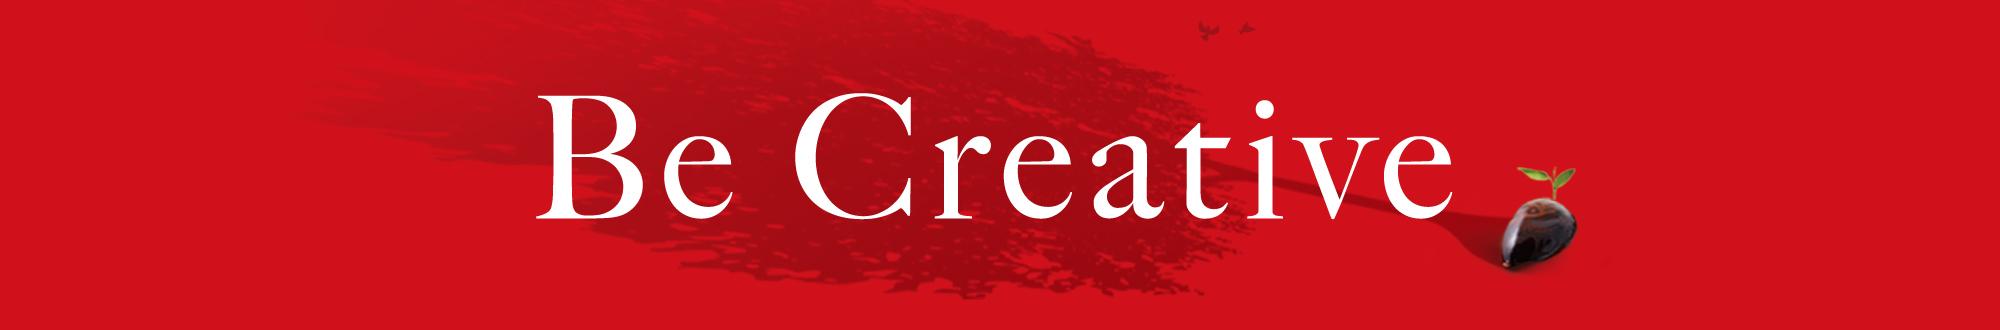 Siseido Design inc.